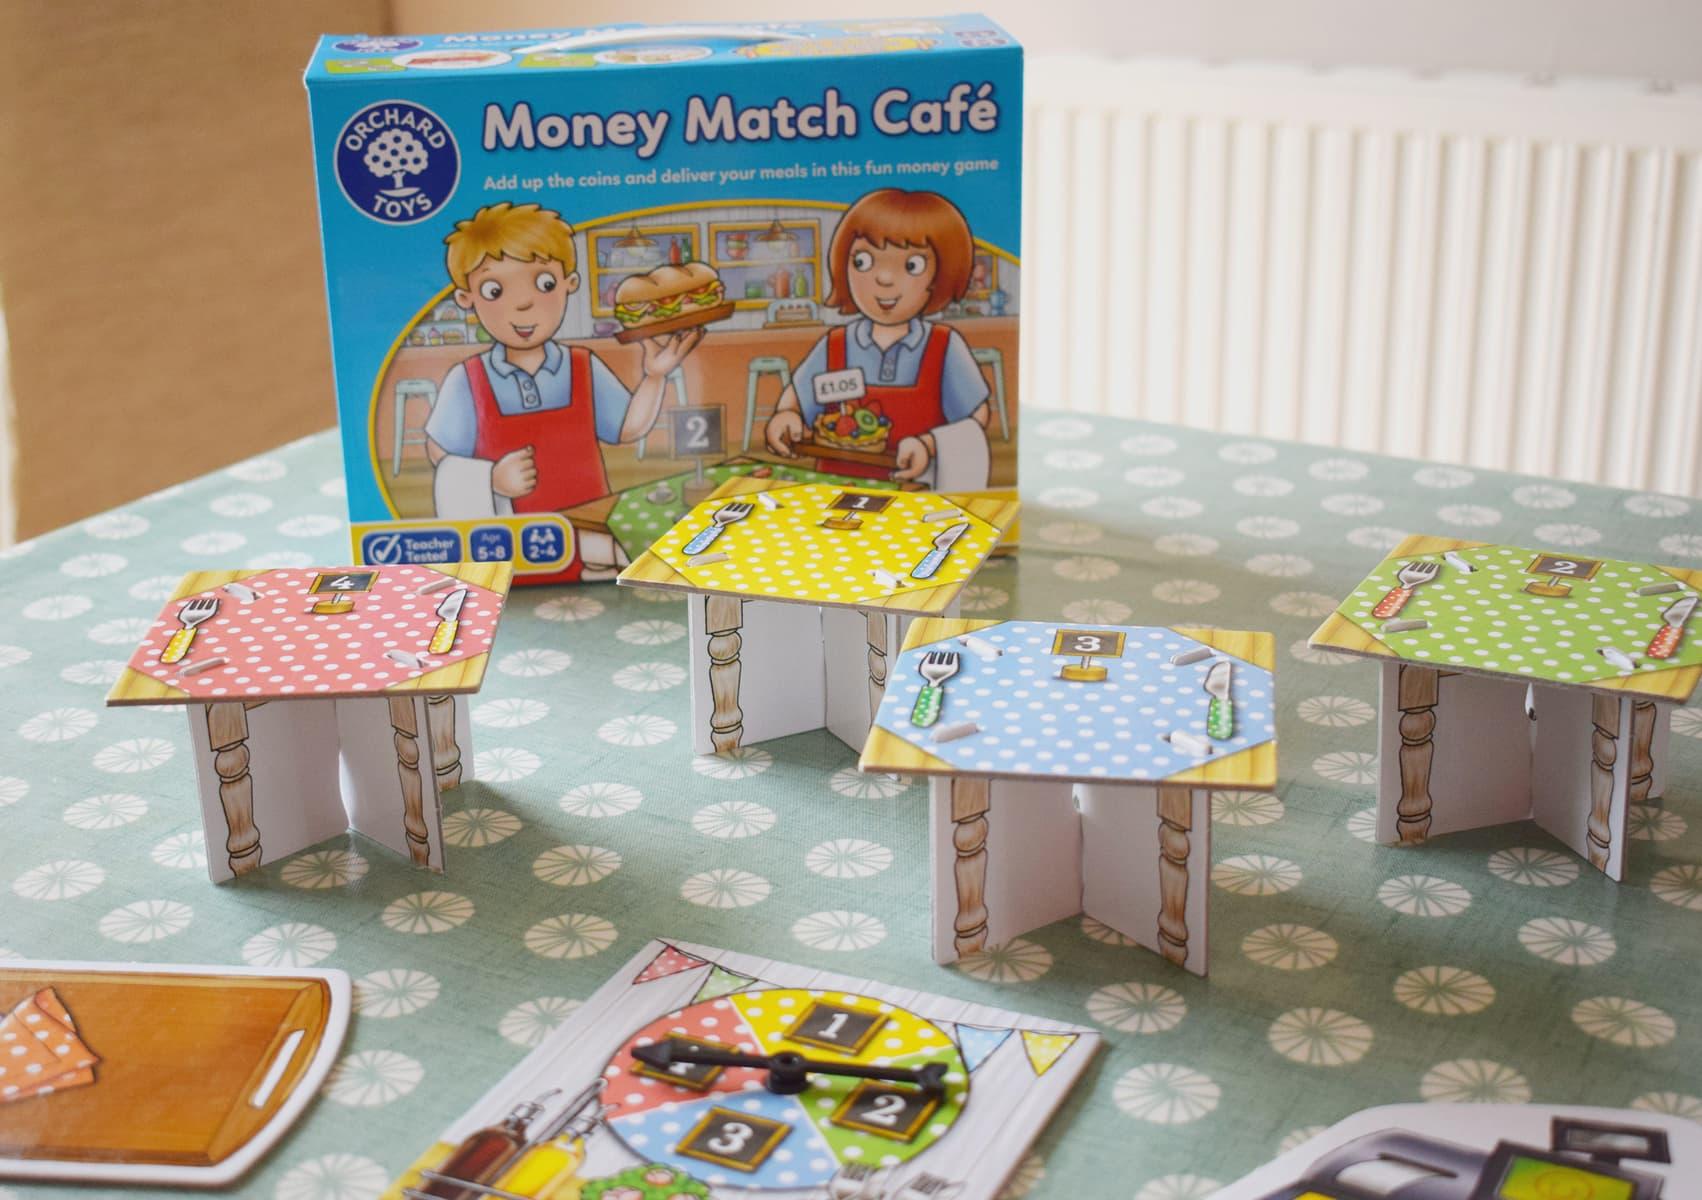 money-match-cafe-orchard-toys-ft